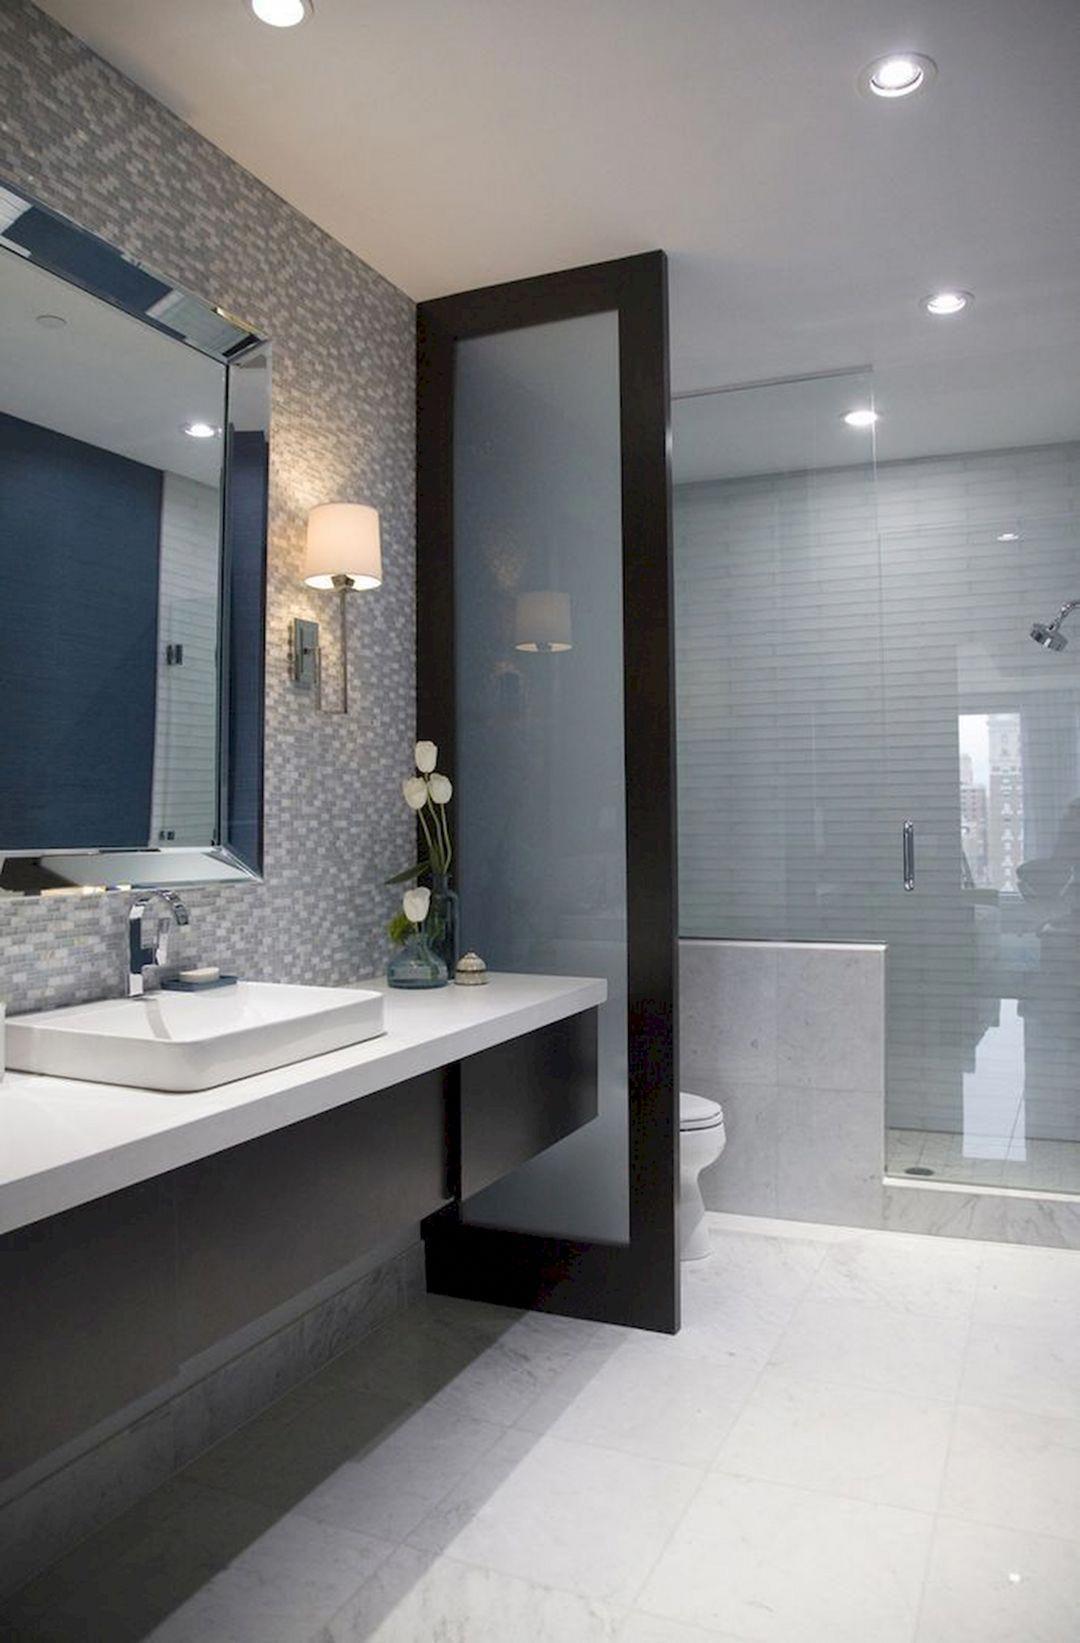 Gorgeous 43 Long Narrow Bathroom Design Ideas You Never Seen Before Narrow Bathroom Designs Bathroom Layout Modern Bathroom Design Viral home designer bathroom design